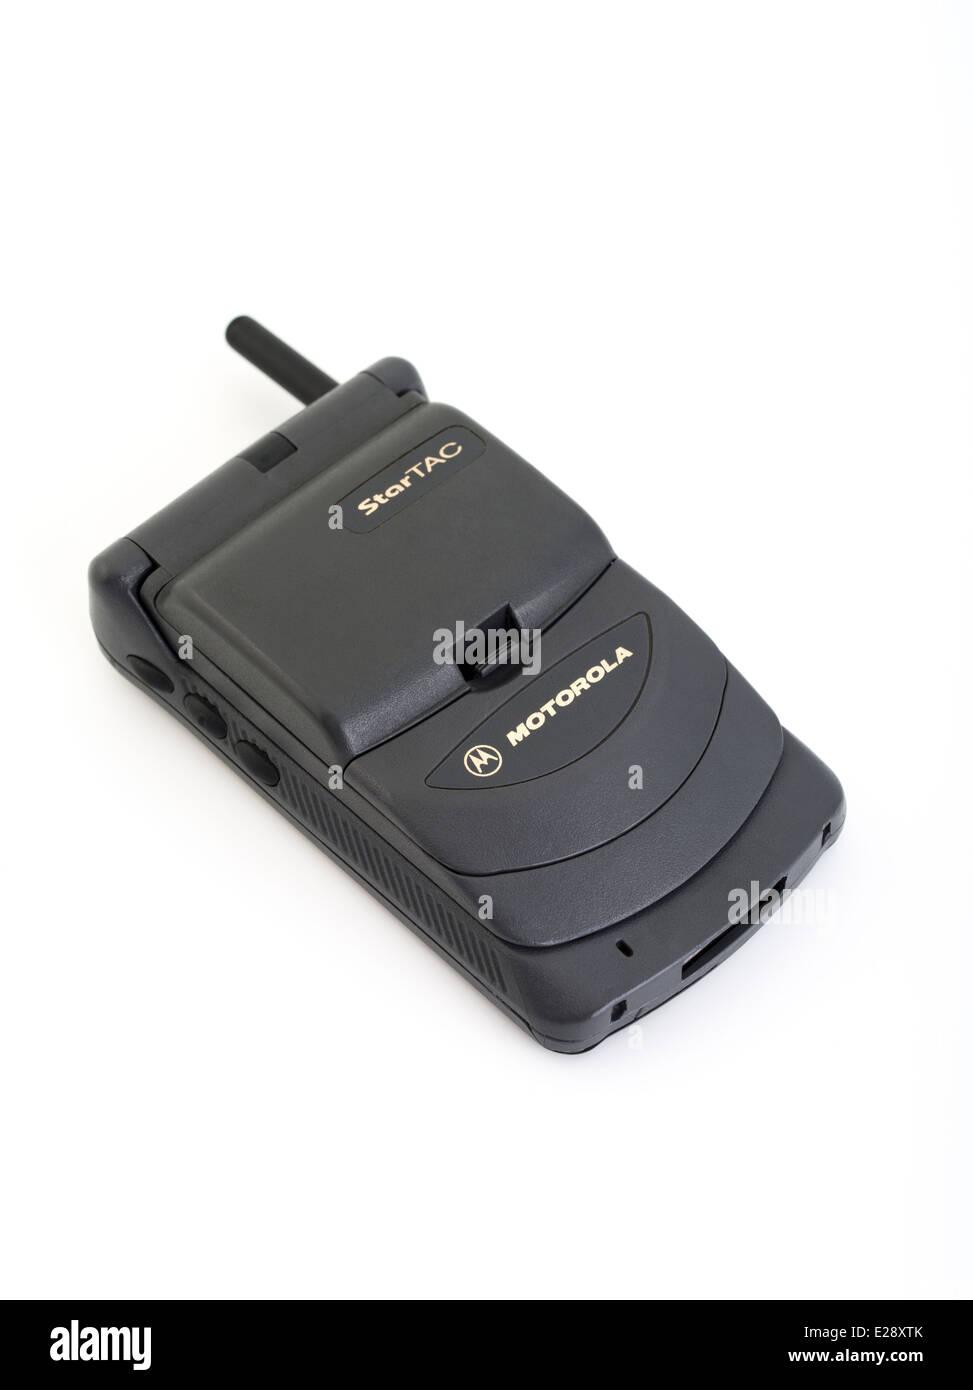 Motorola StarTAC star tac 85. First Clamshell / flip mobile phone released 1996 - Stock Image